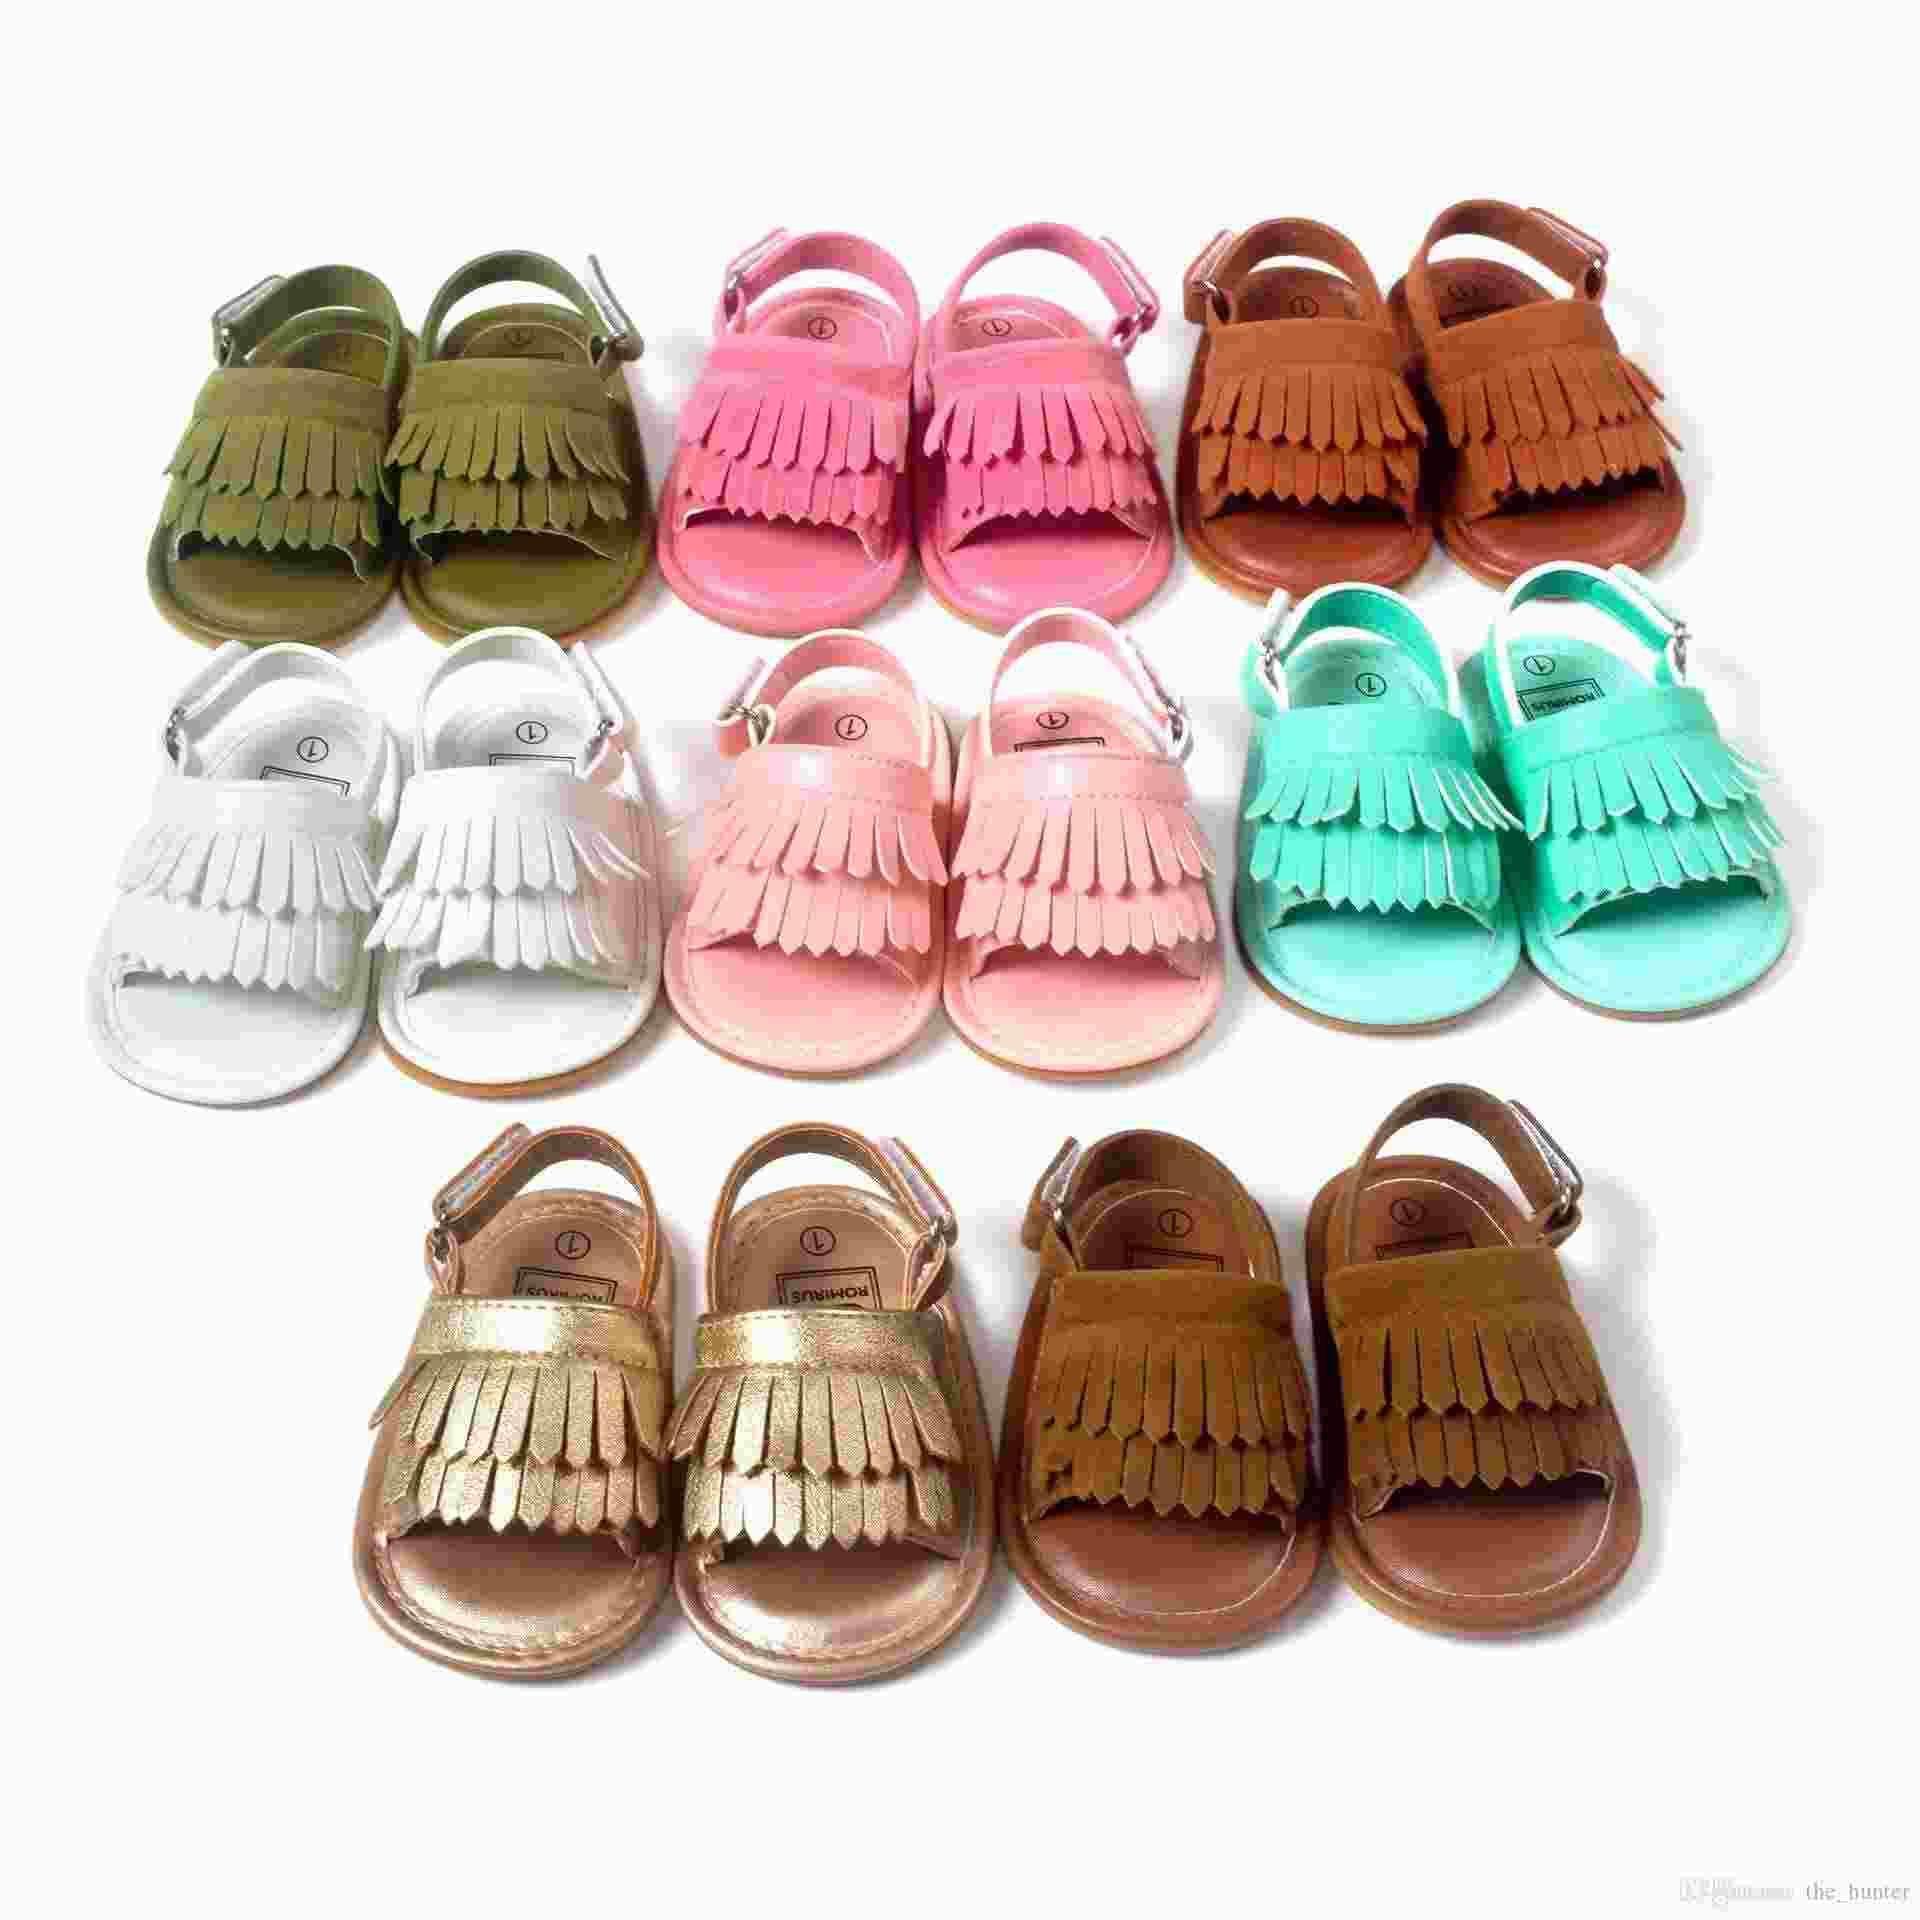 Sandalias De Y Calzado Bebé Niños Con Verano Zapatillas Borla Para Niñas Infantiles Zapatos mw08nN